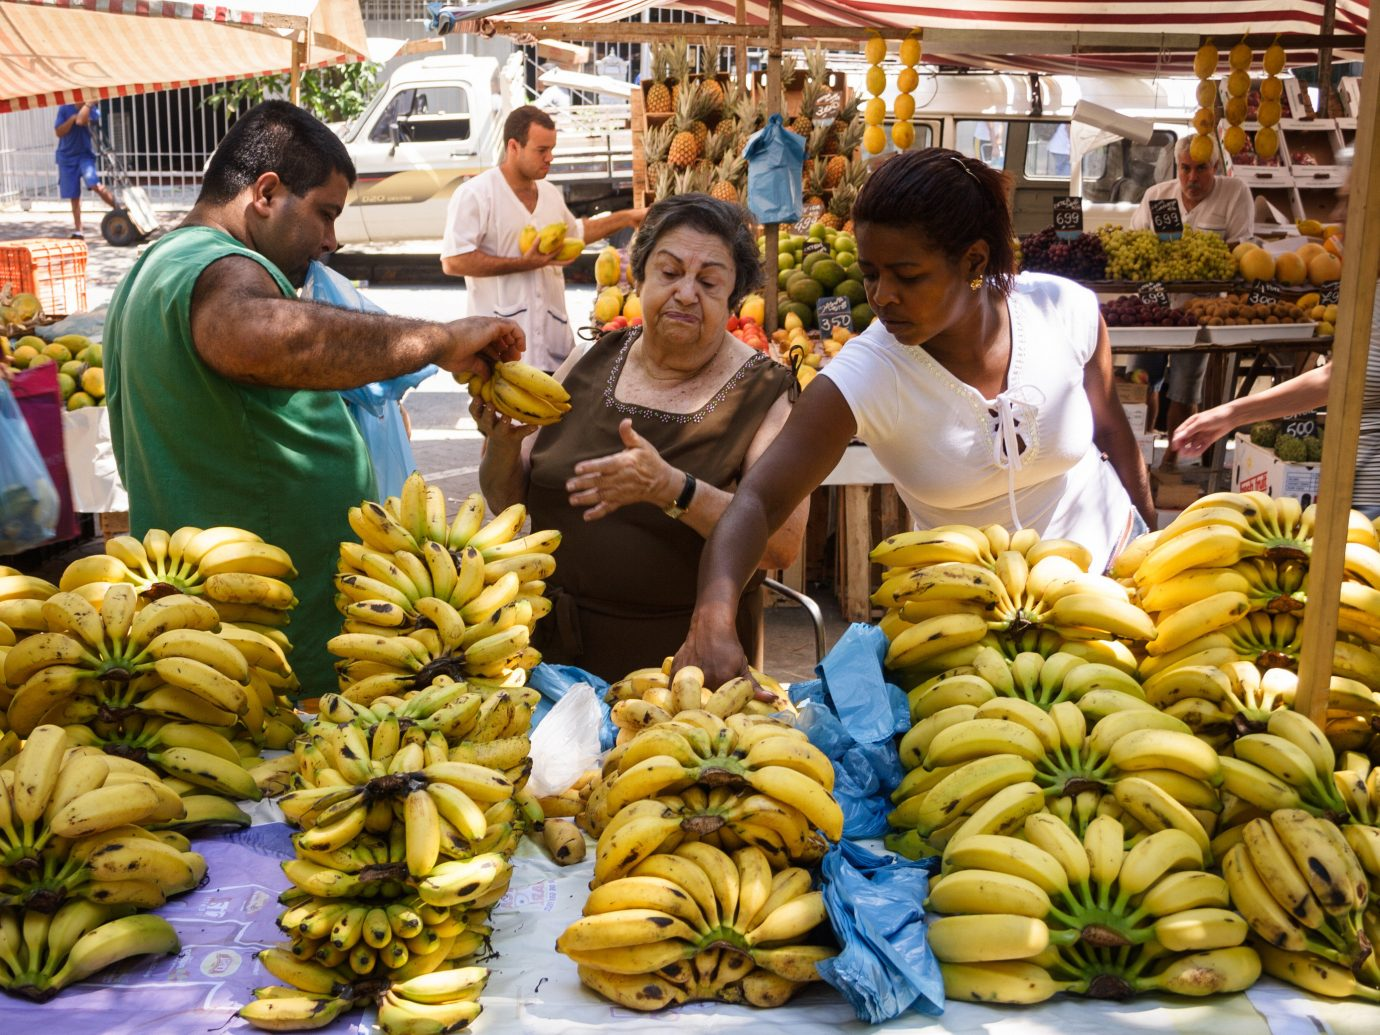 Trip Ideas person marketplace City market public space vendor human settlement food produce banana carving flower sale several fresh